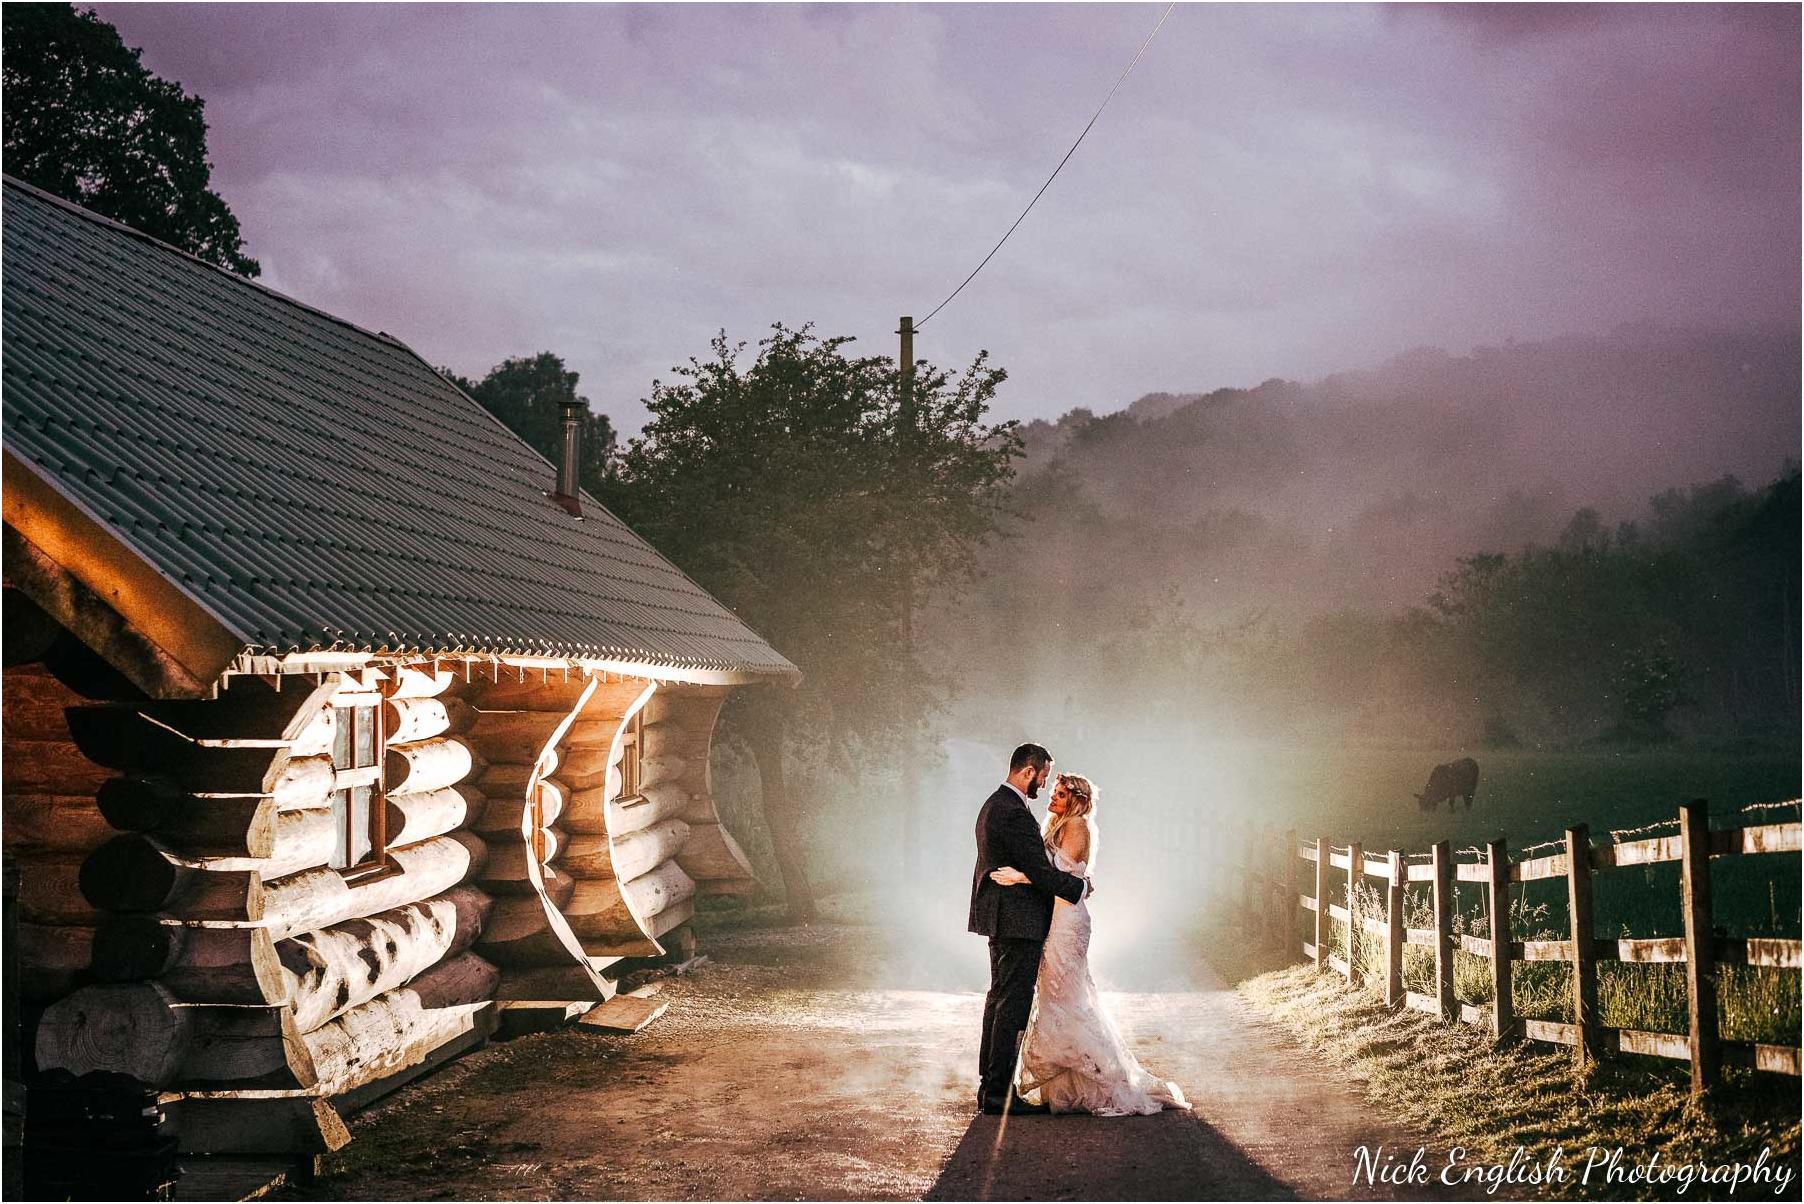 Whitebottom_Farm_Wedding_Manchester_Photograph-147.jpg